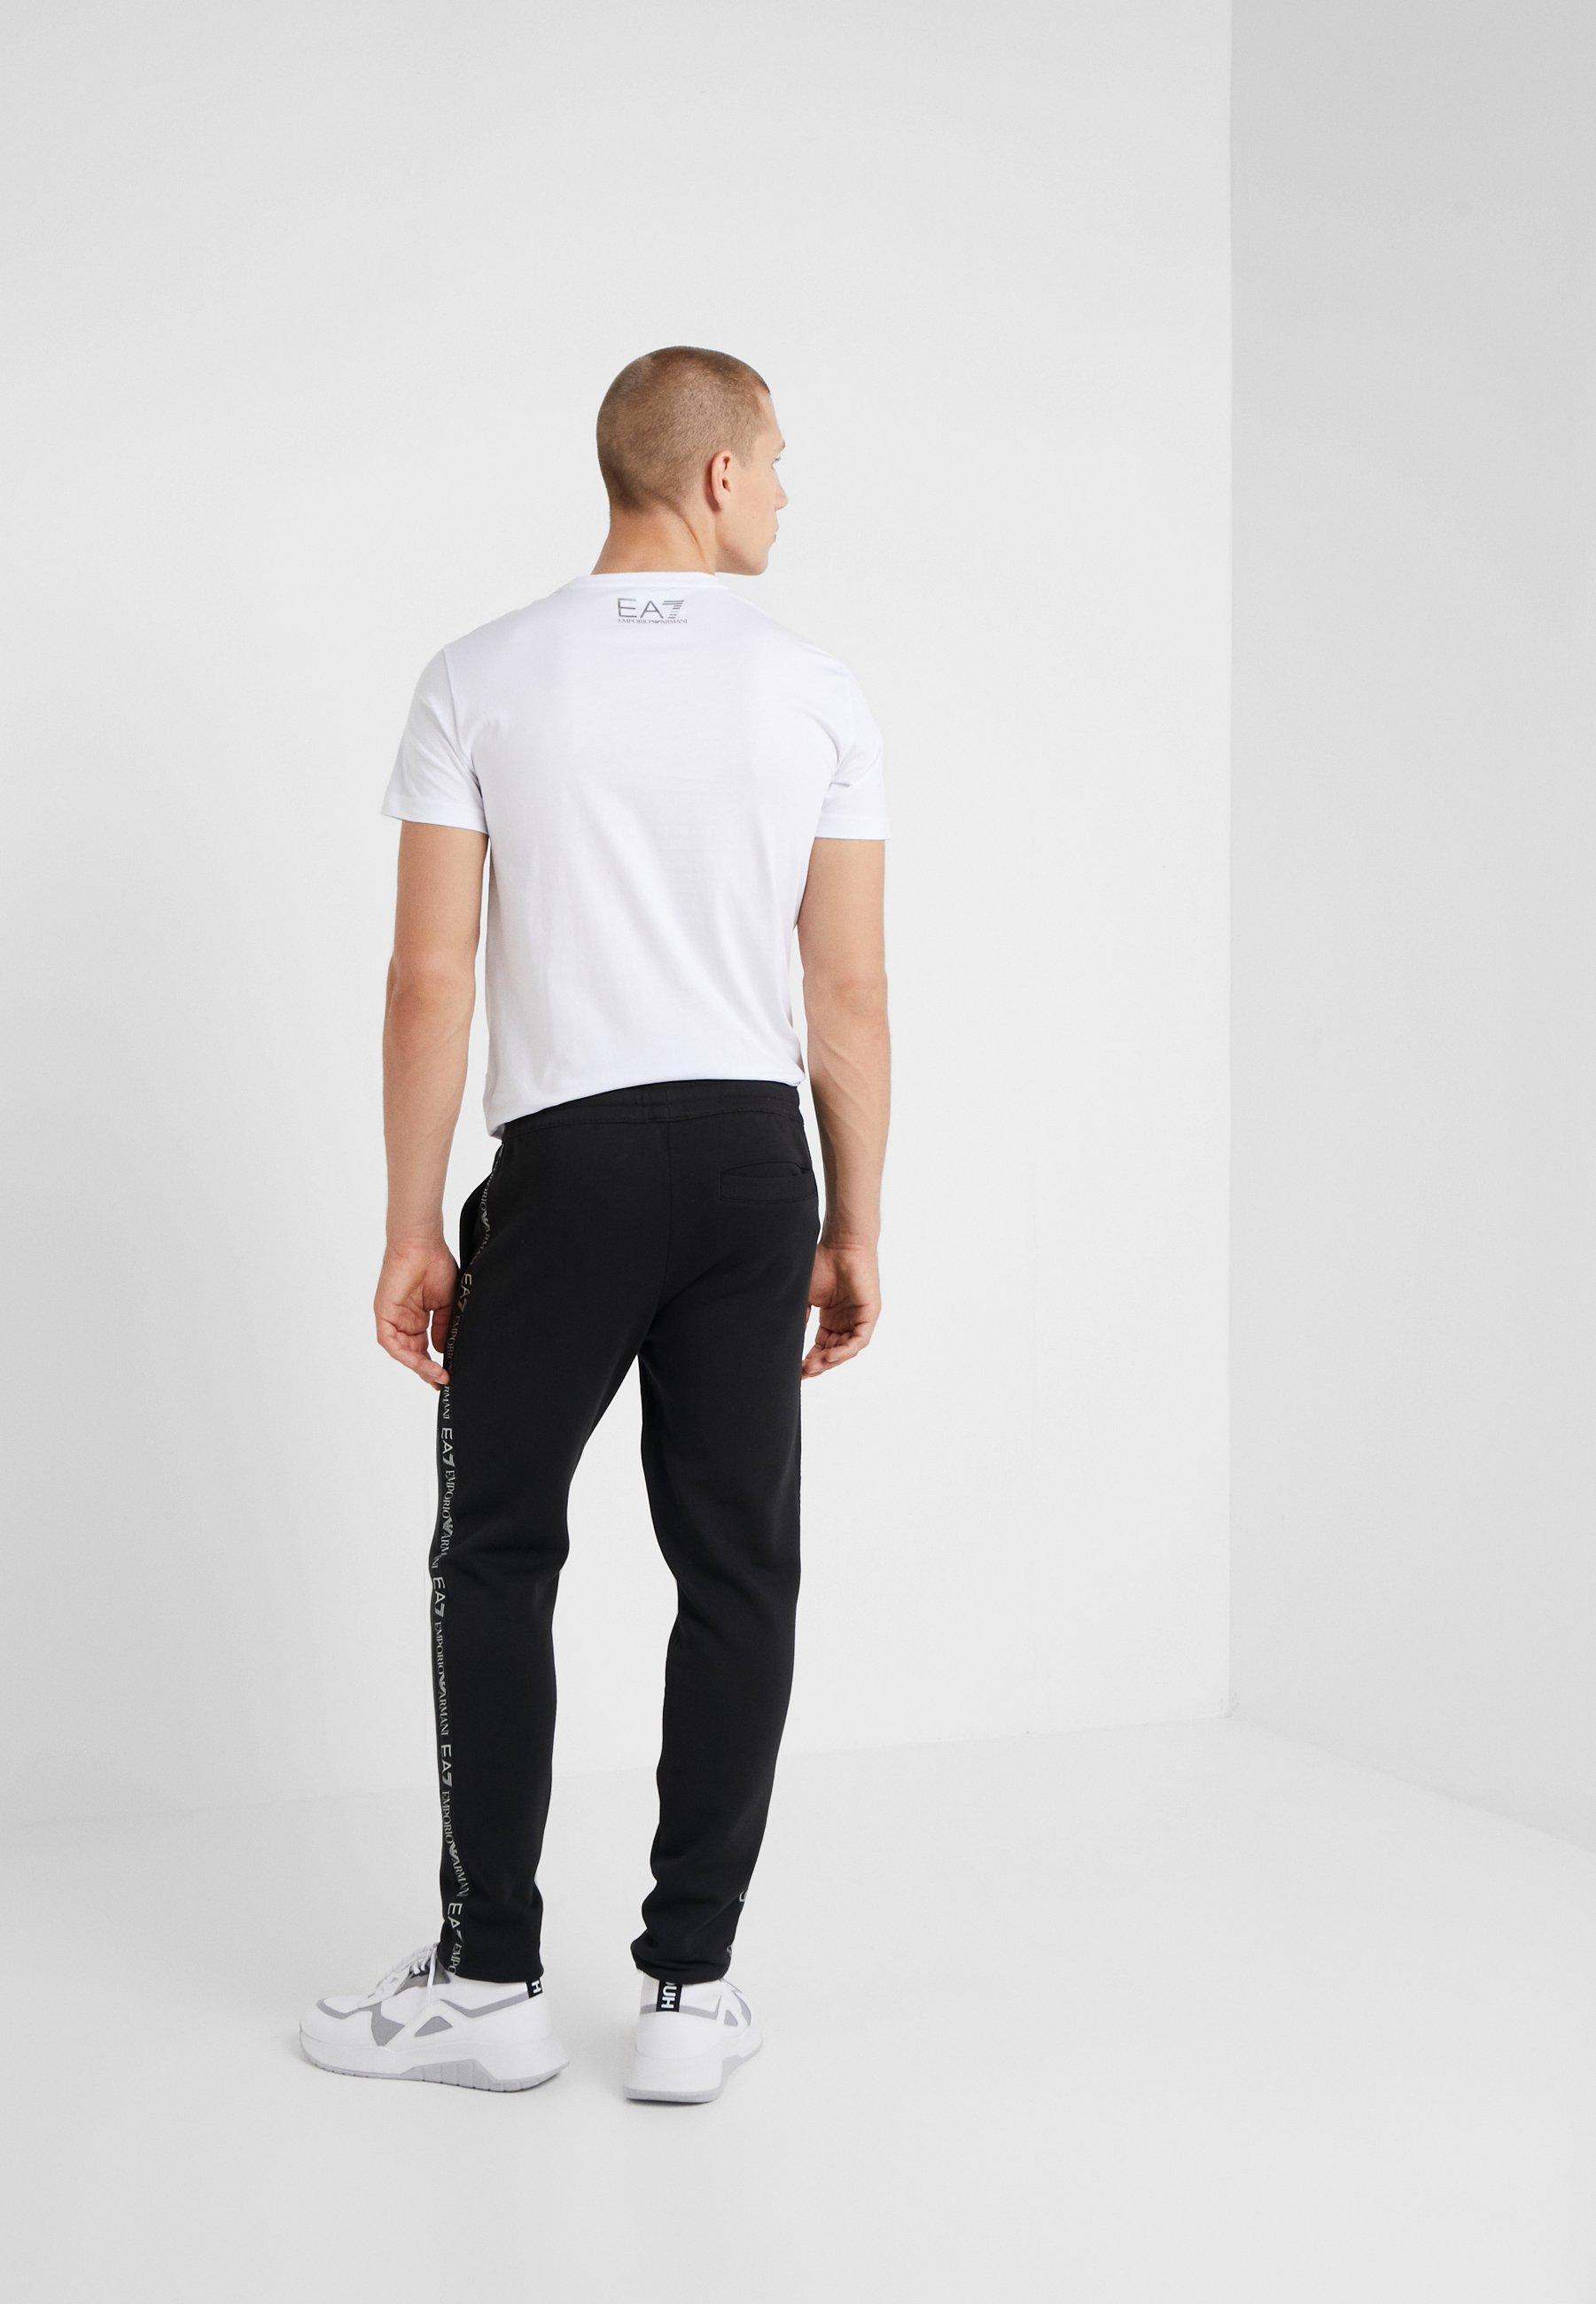 TrouserPantalon De Emporio Armani Survêtement Black Ea7 MqLVpUGSz